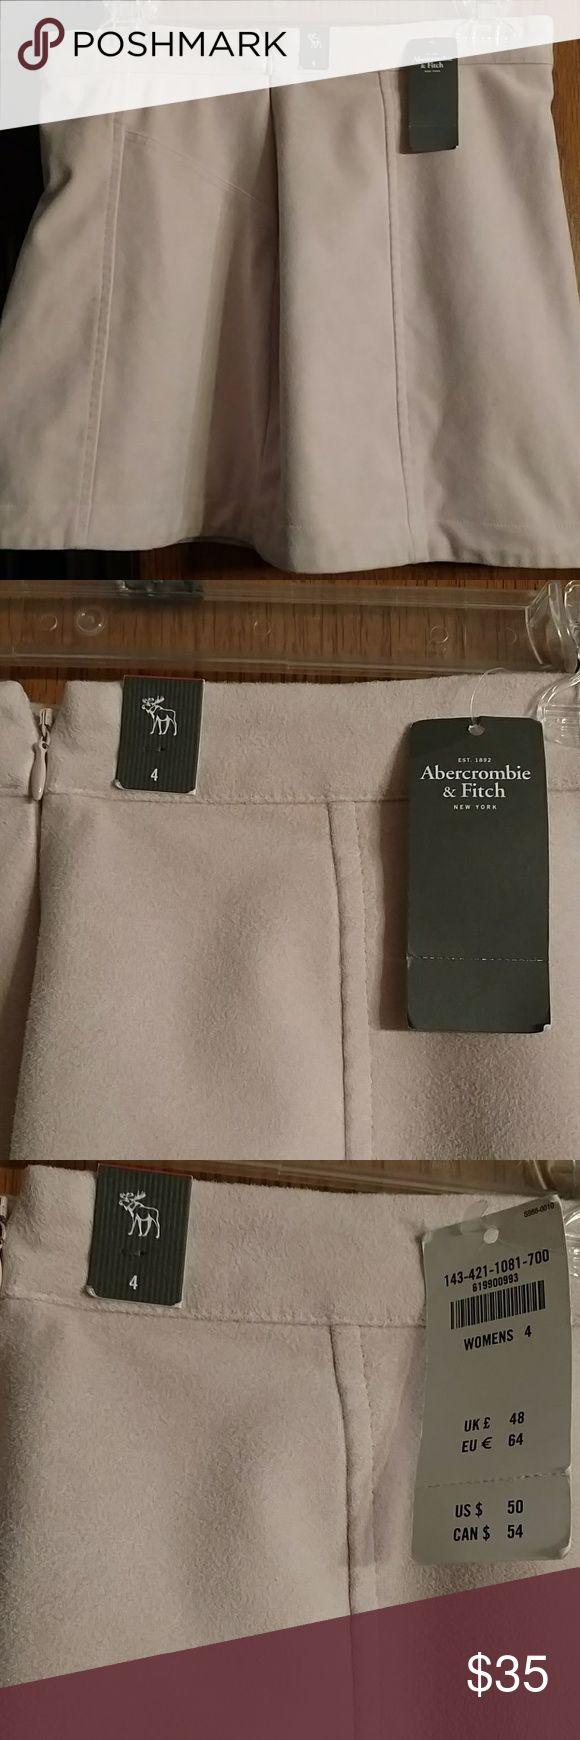 Abercrombie and Fitch Mini Skirt NWT Abercrombie and Fitch Mini Skirt NWT. Cream Abercrombie & Fitch Skirts Mini